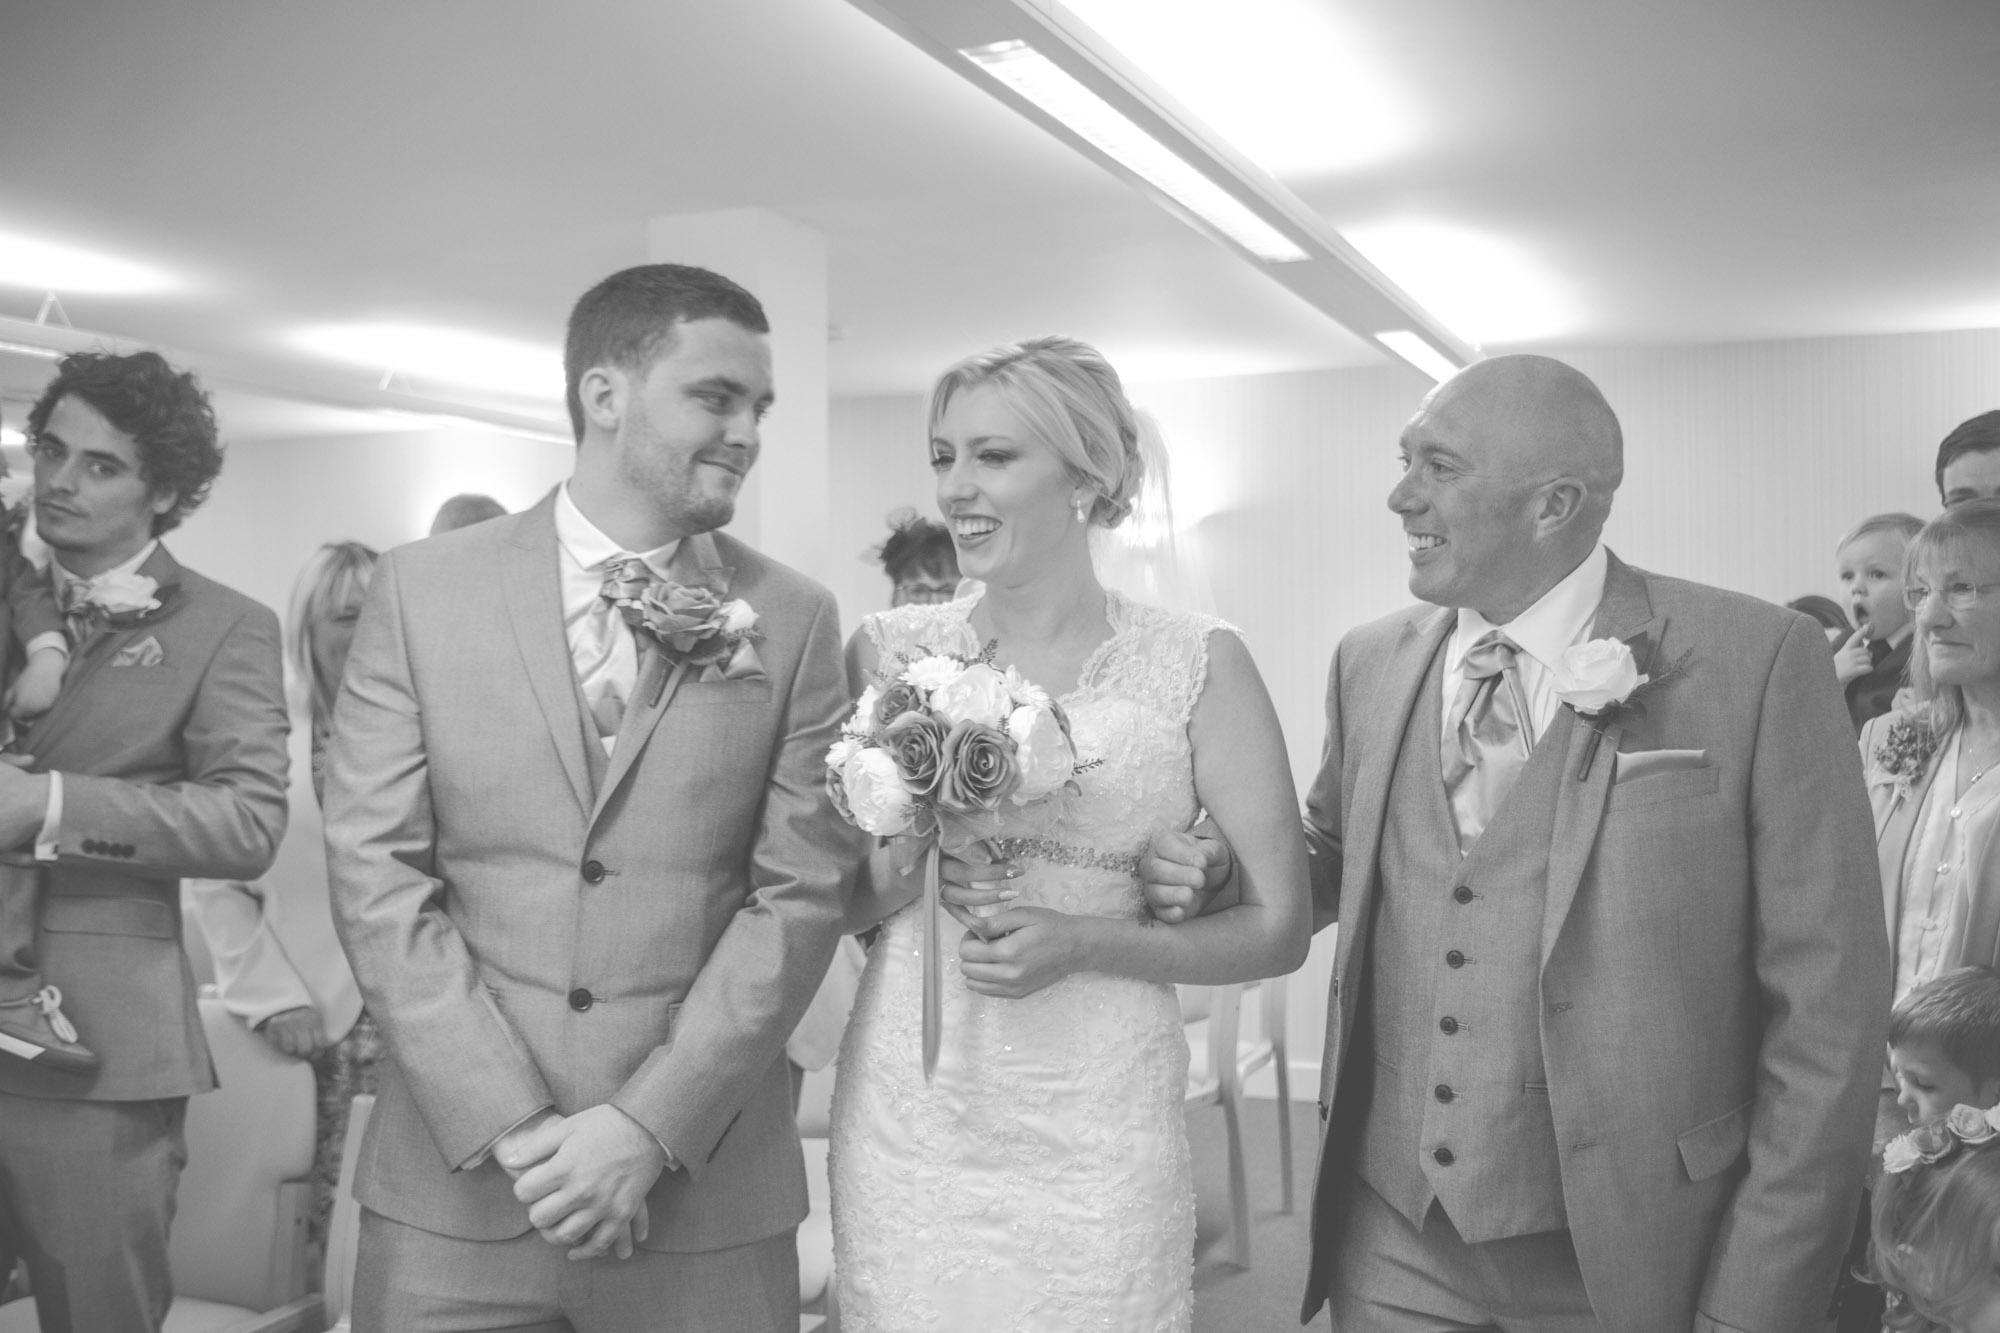 skipton-registry-office-wedding-photography-23.jpg